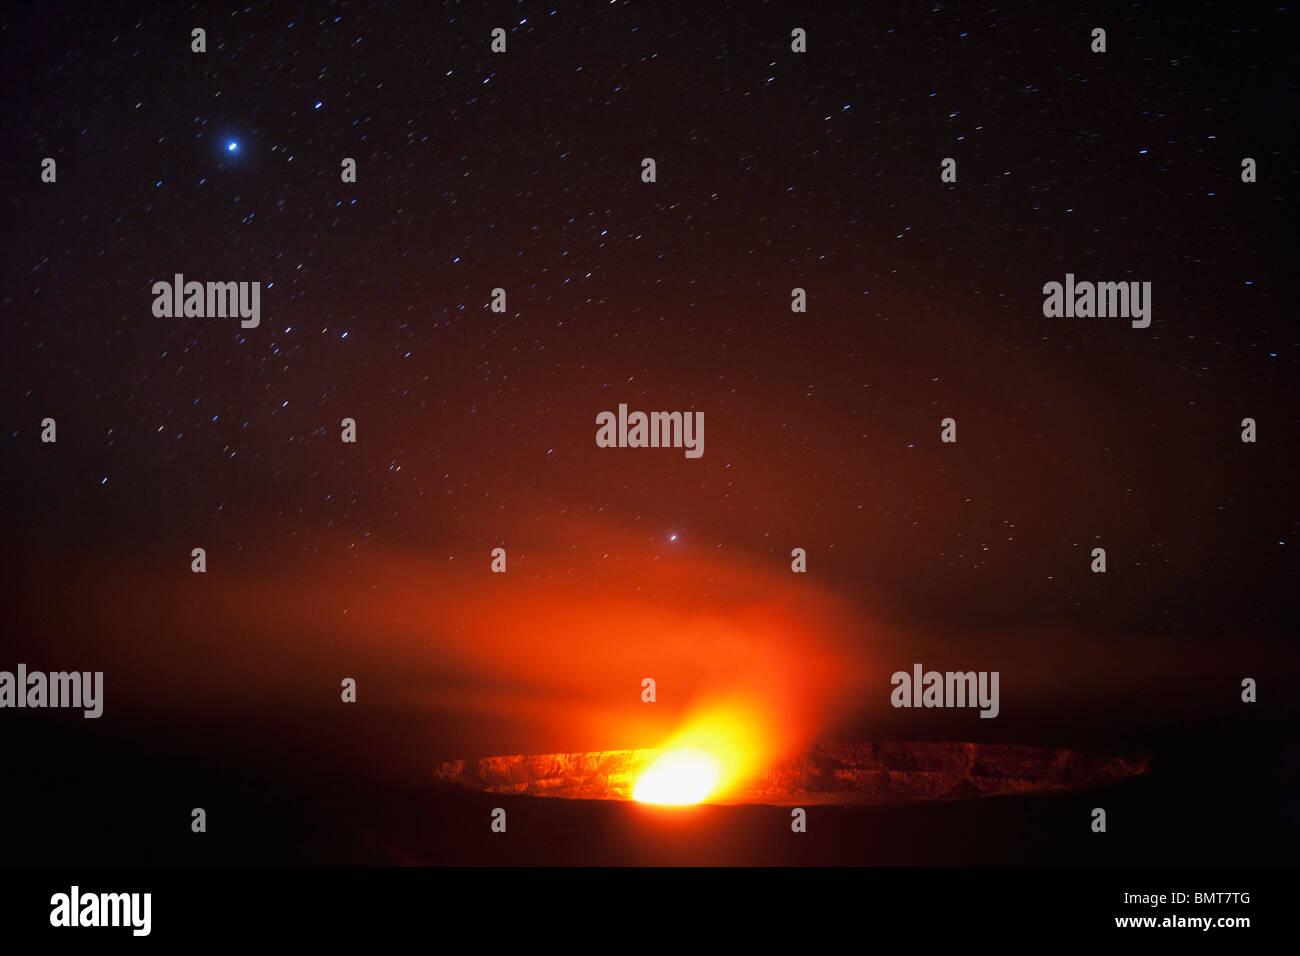 Hawaii, United States Of America; Halema'uma'u Vent Inside Kilauea Crater Glows From Molten Lava At Night - Stock Image